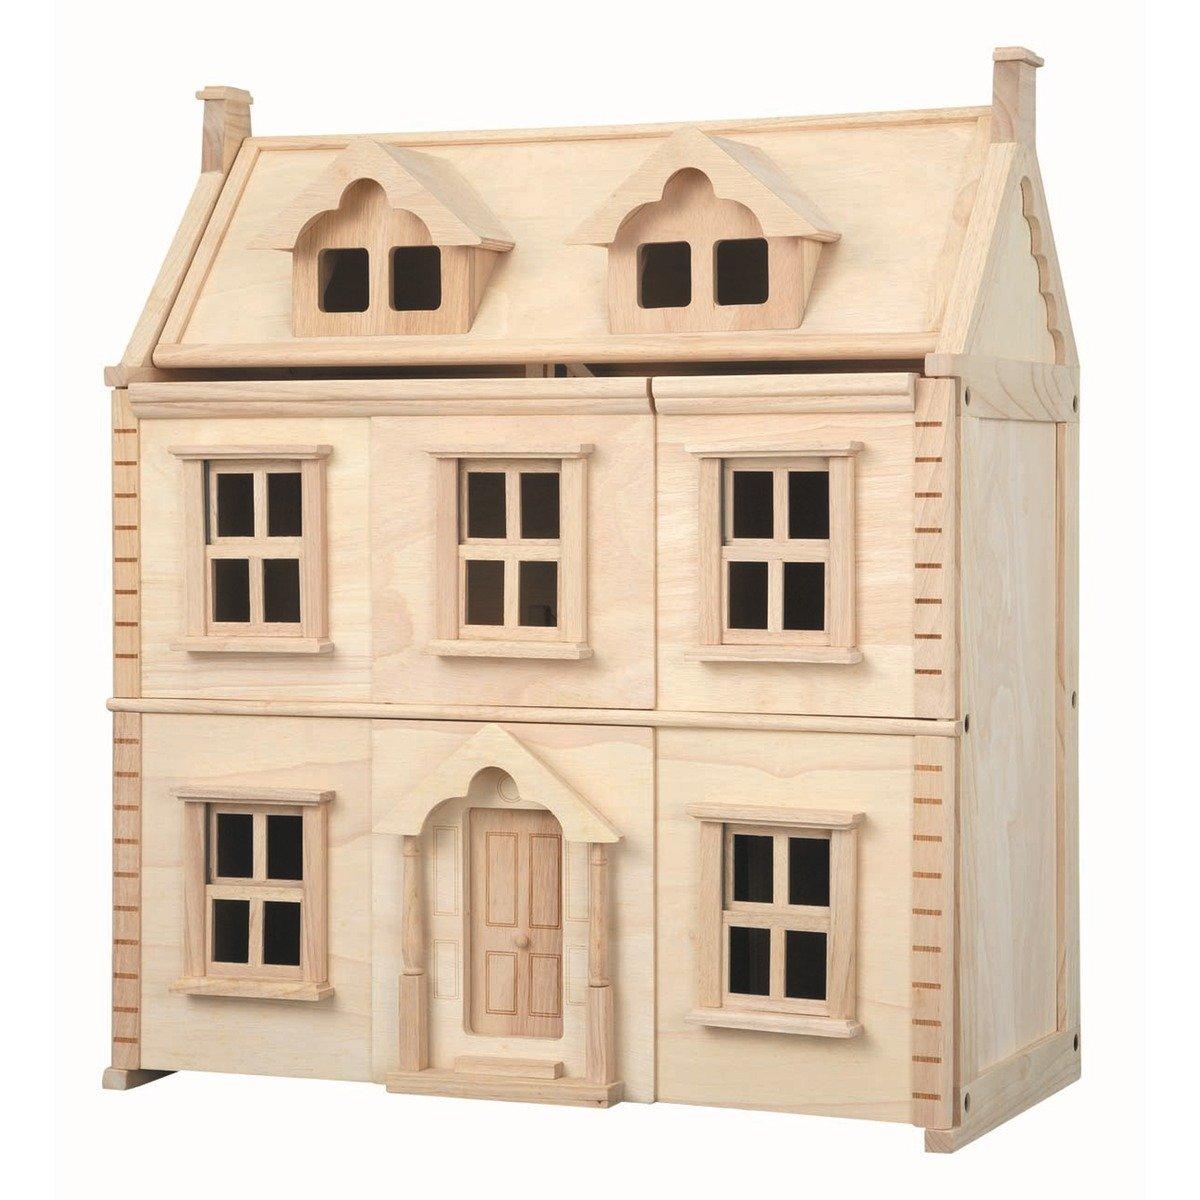 Plantoys Puppenhaus Viktorianisch